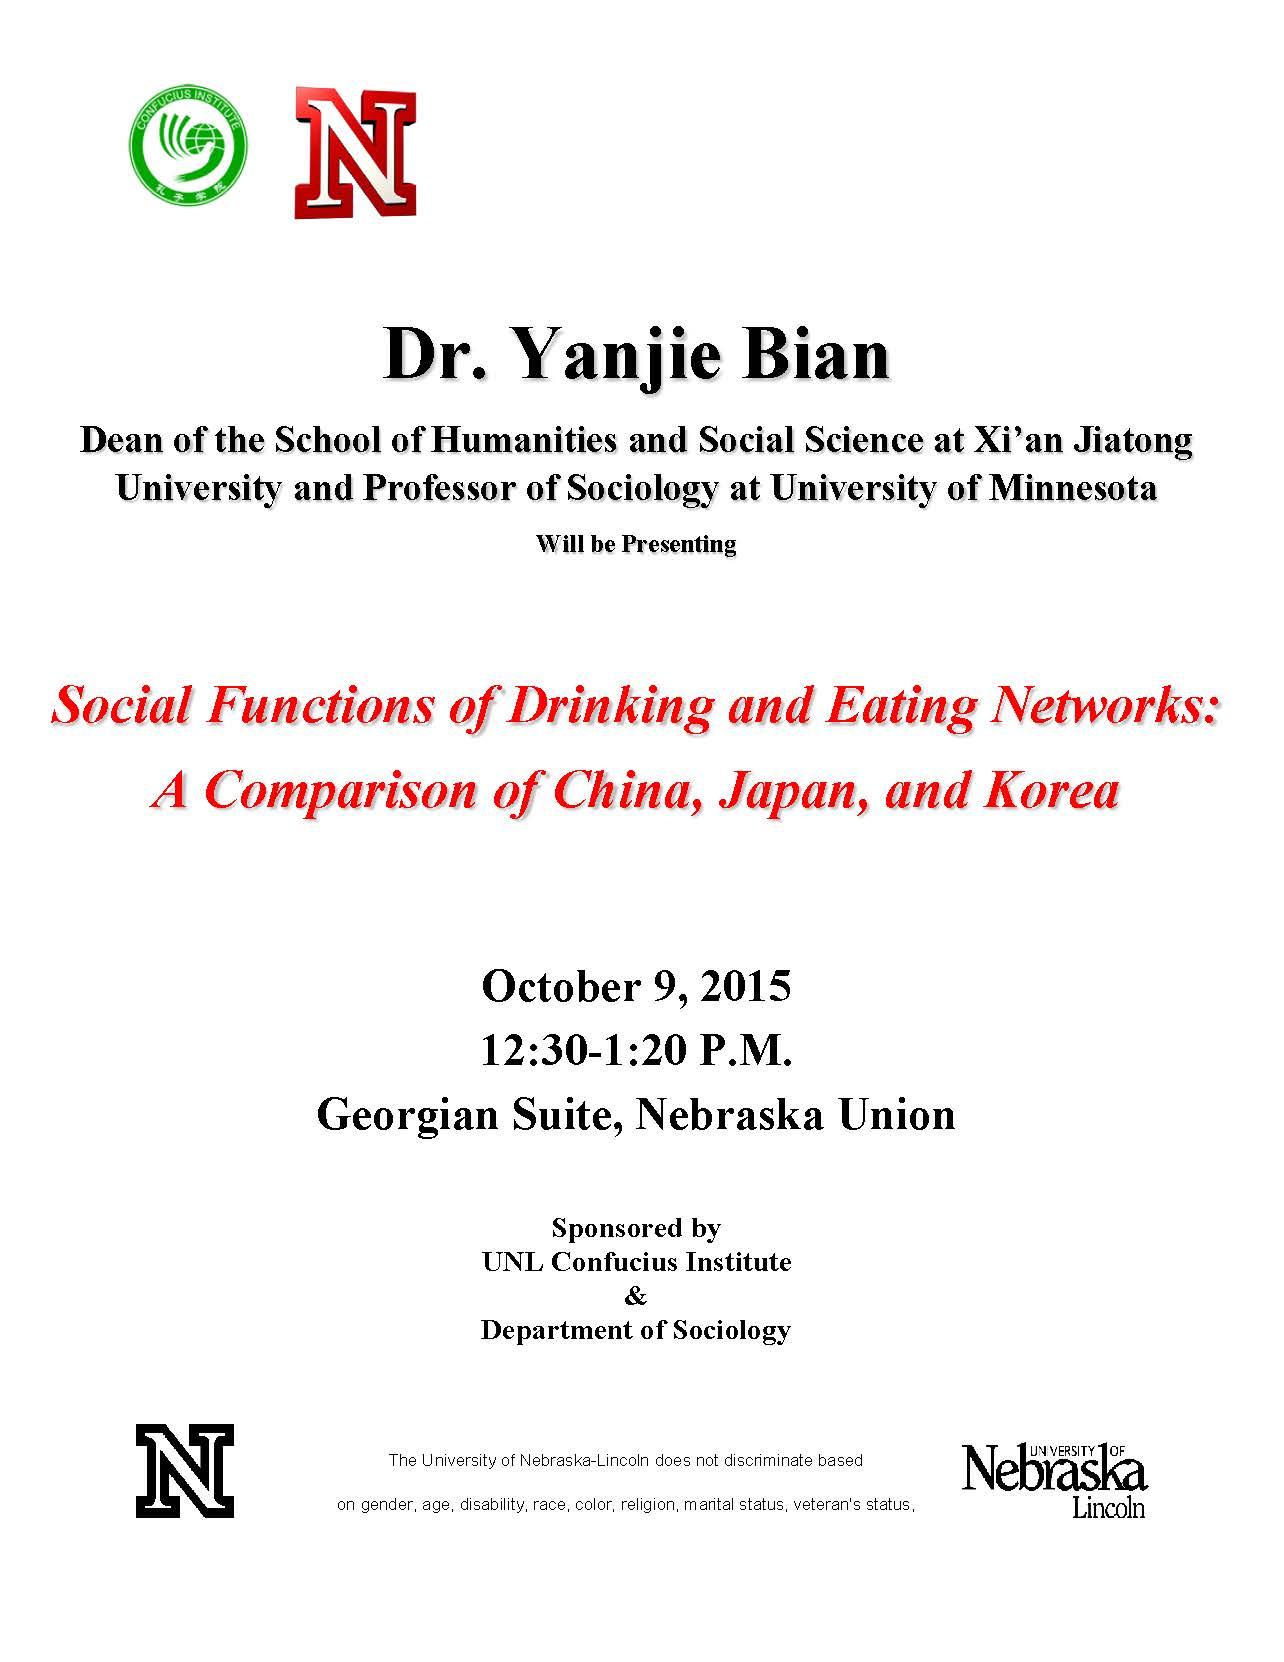 Dr. Yanjie Bian